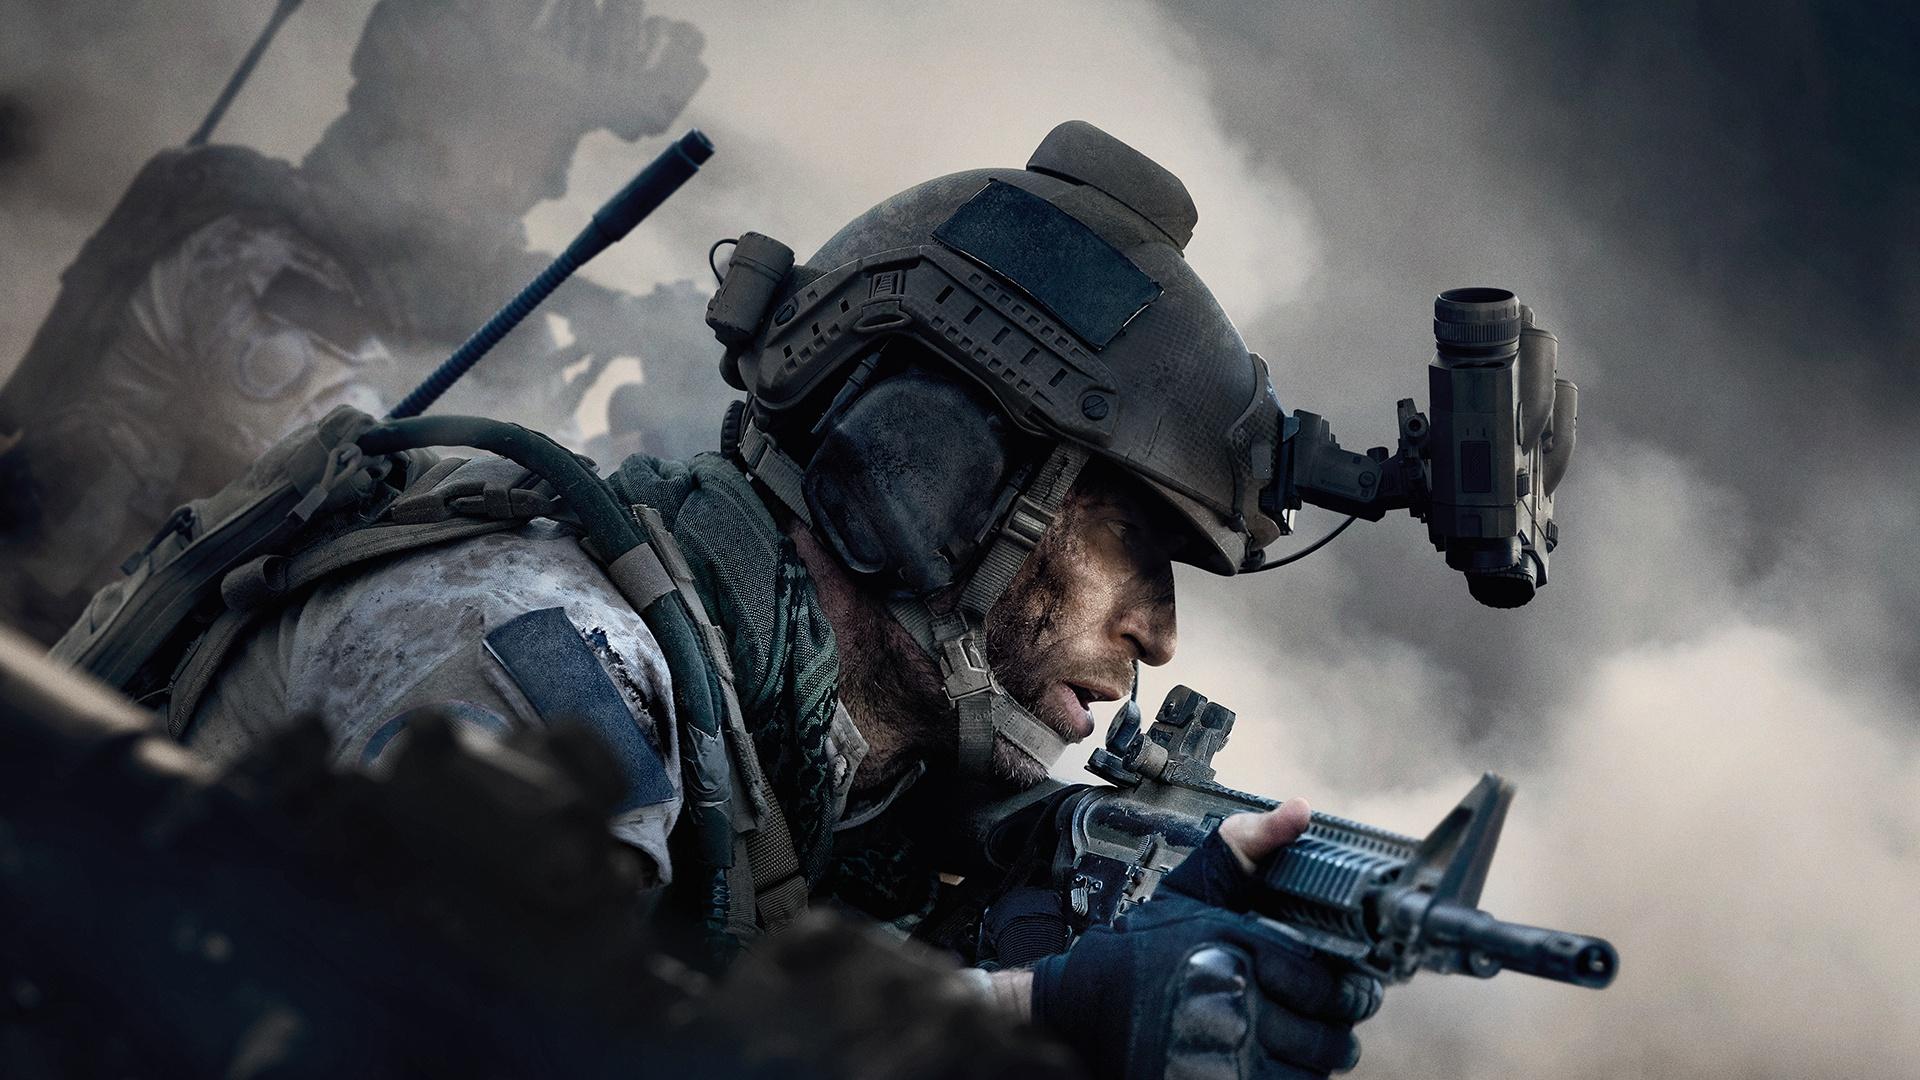 cool call of duty modern warfare wallpapers